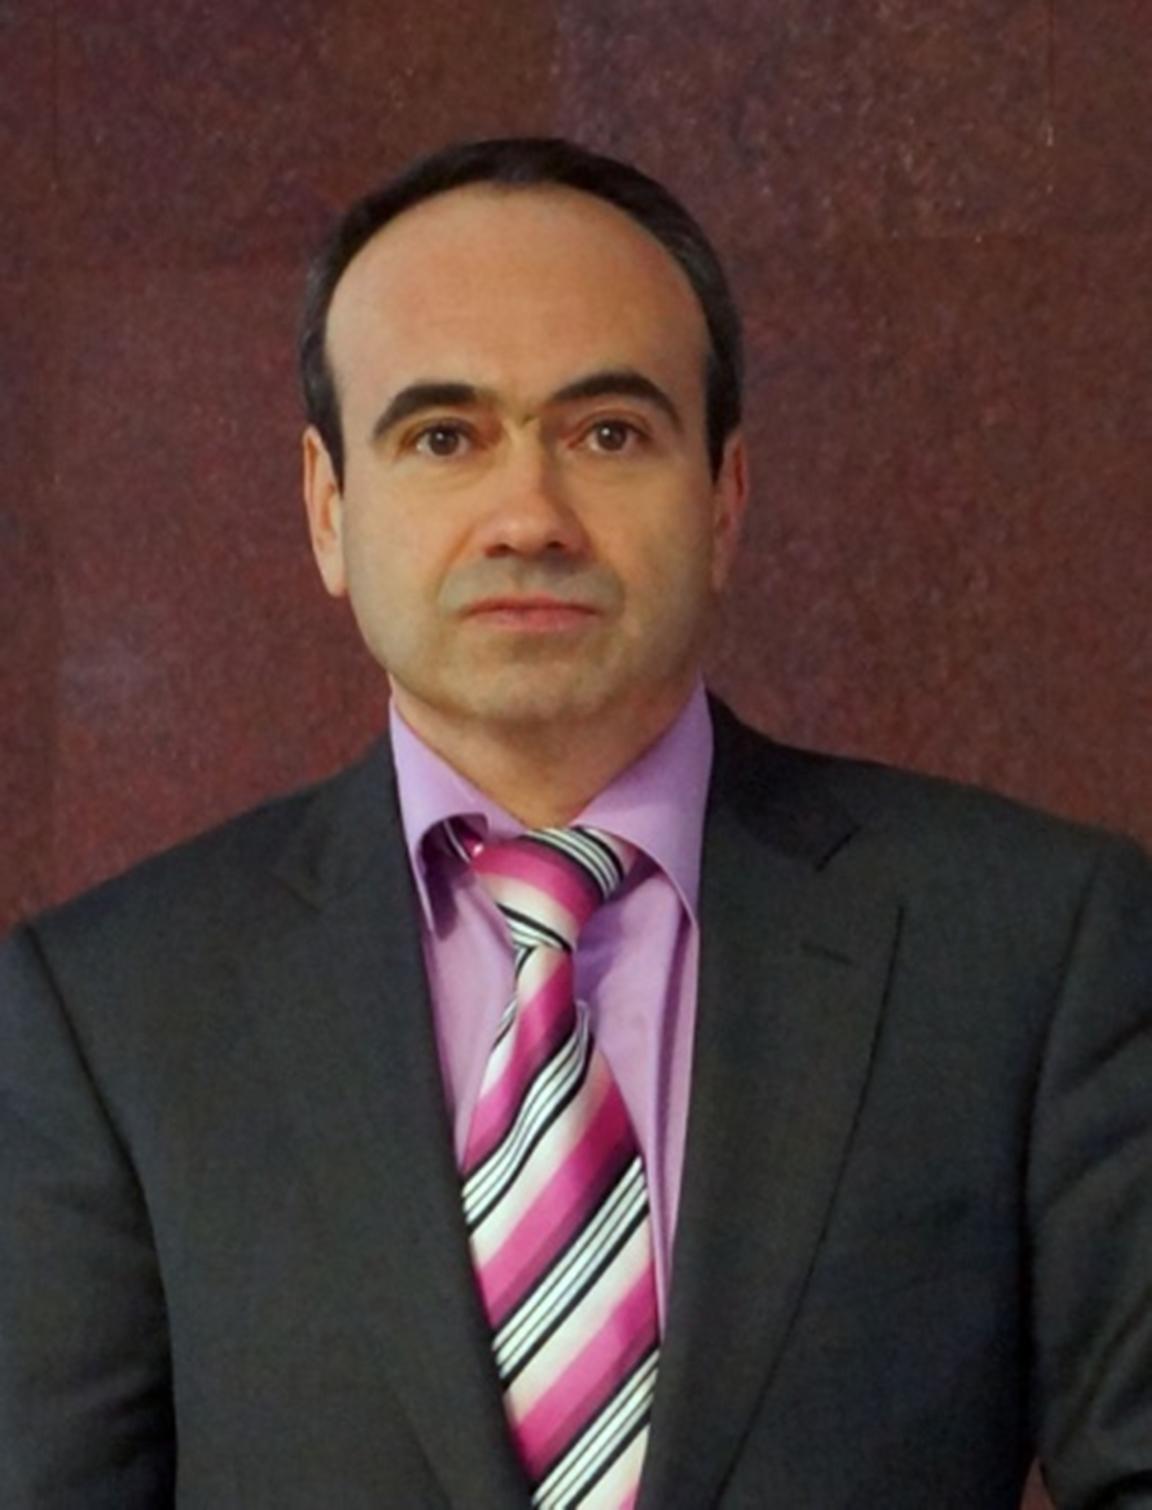 Адвокат Хабнер Евгений Владиславович